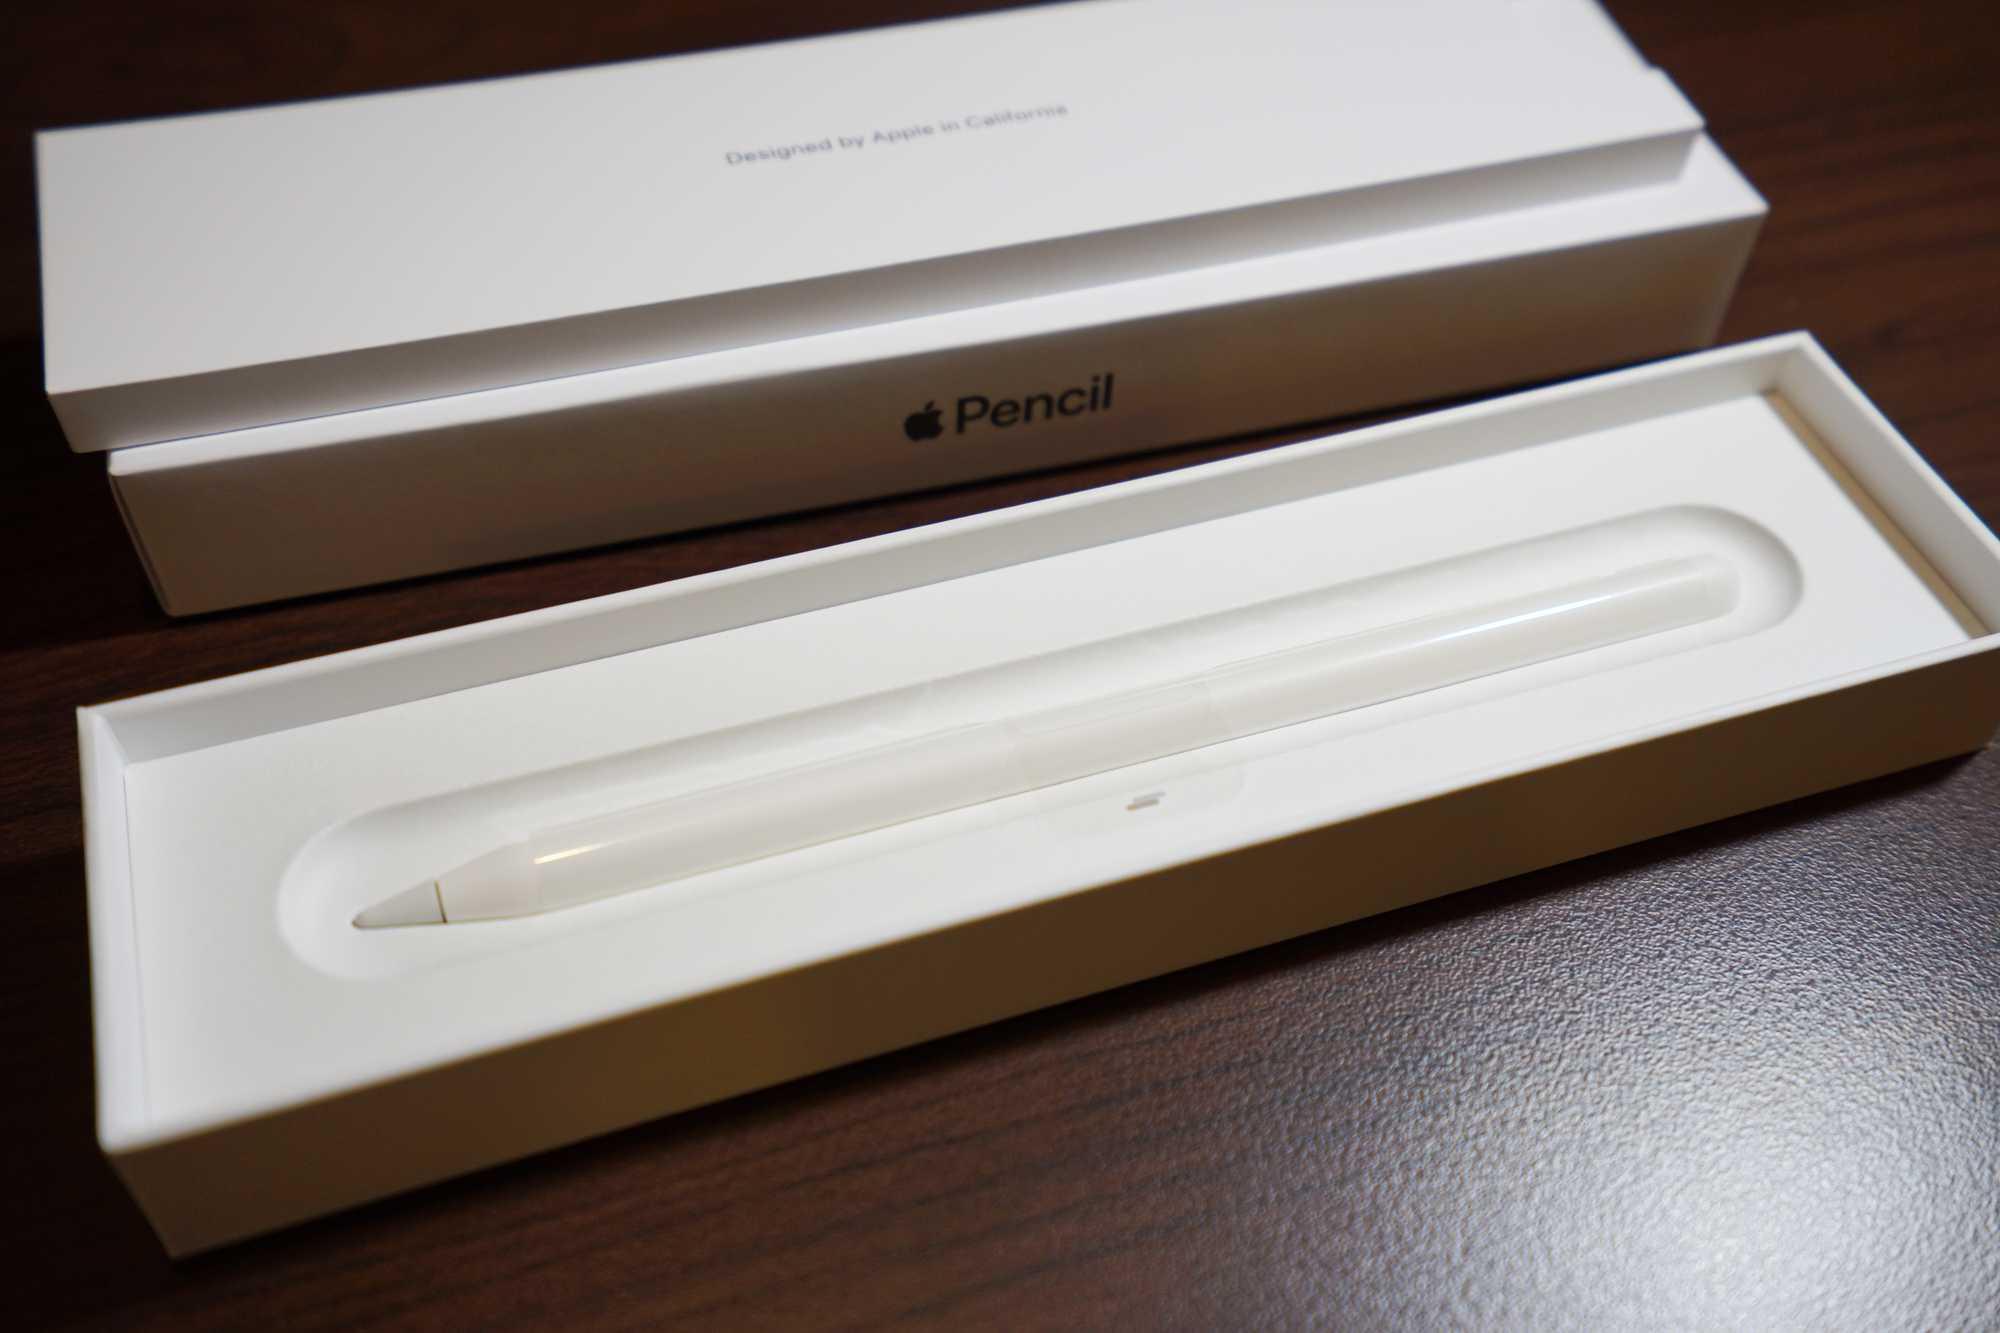 Apple Pencil in the box